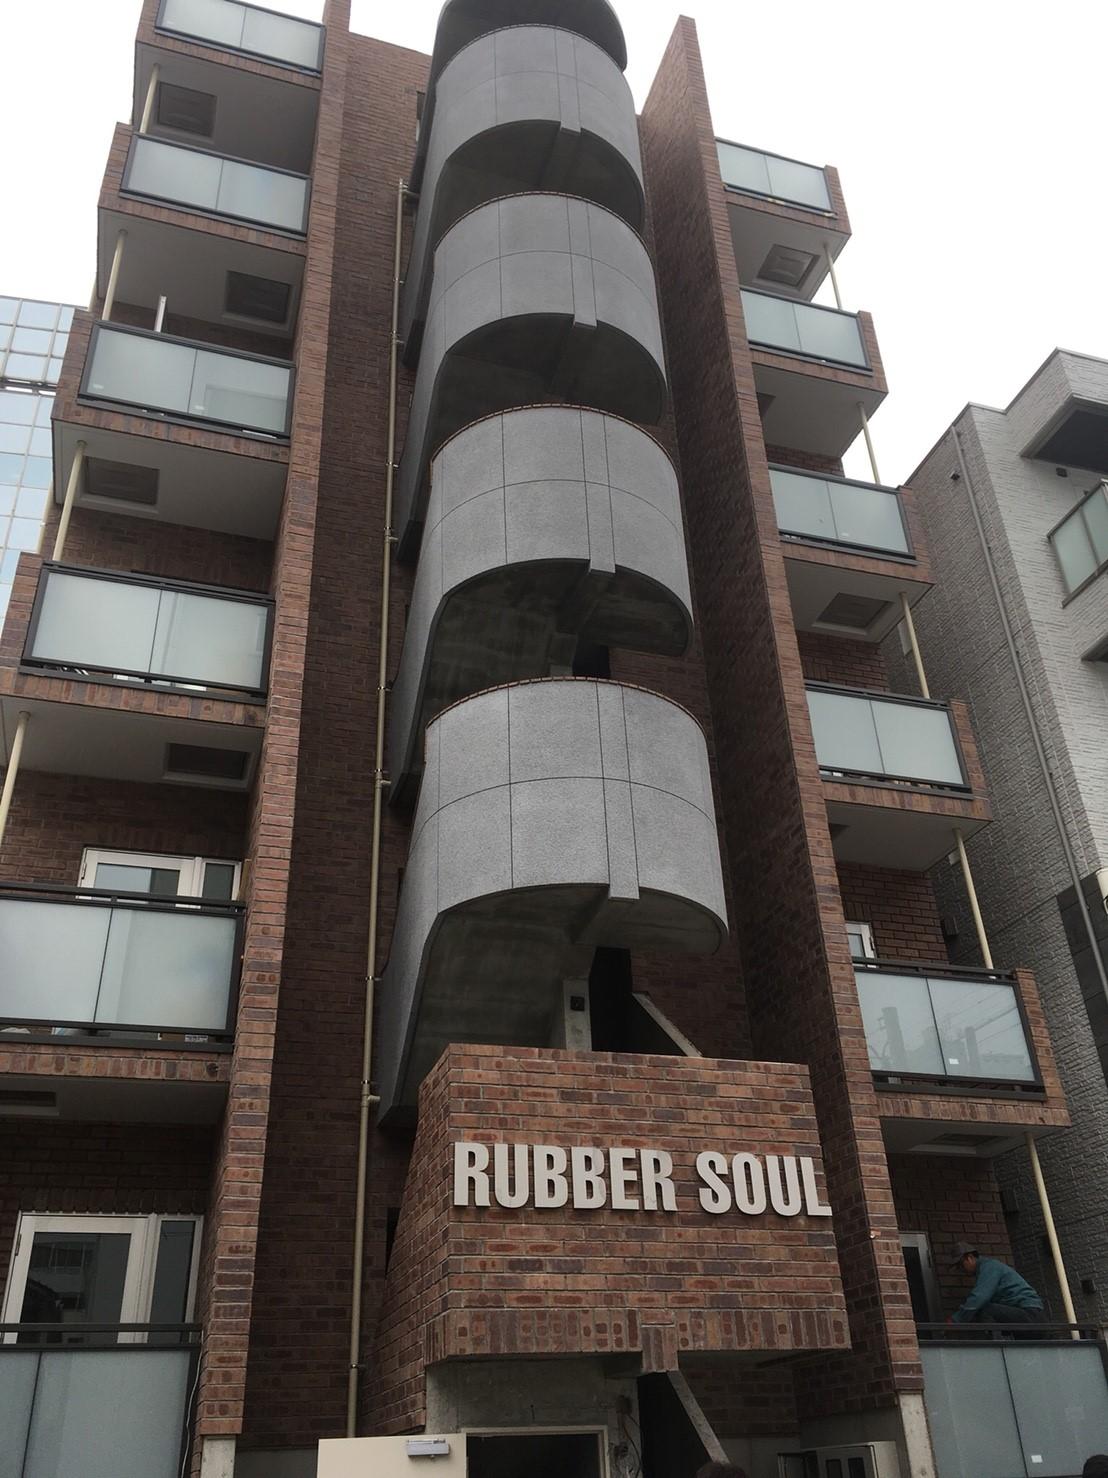 RUBBER SOUL(ラバー・ソウル)の外観